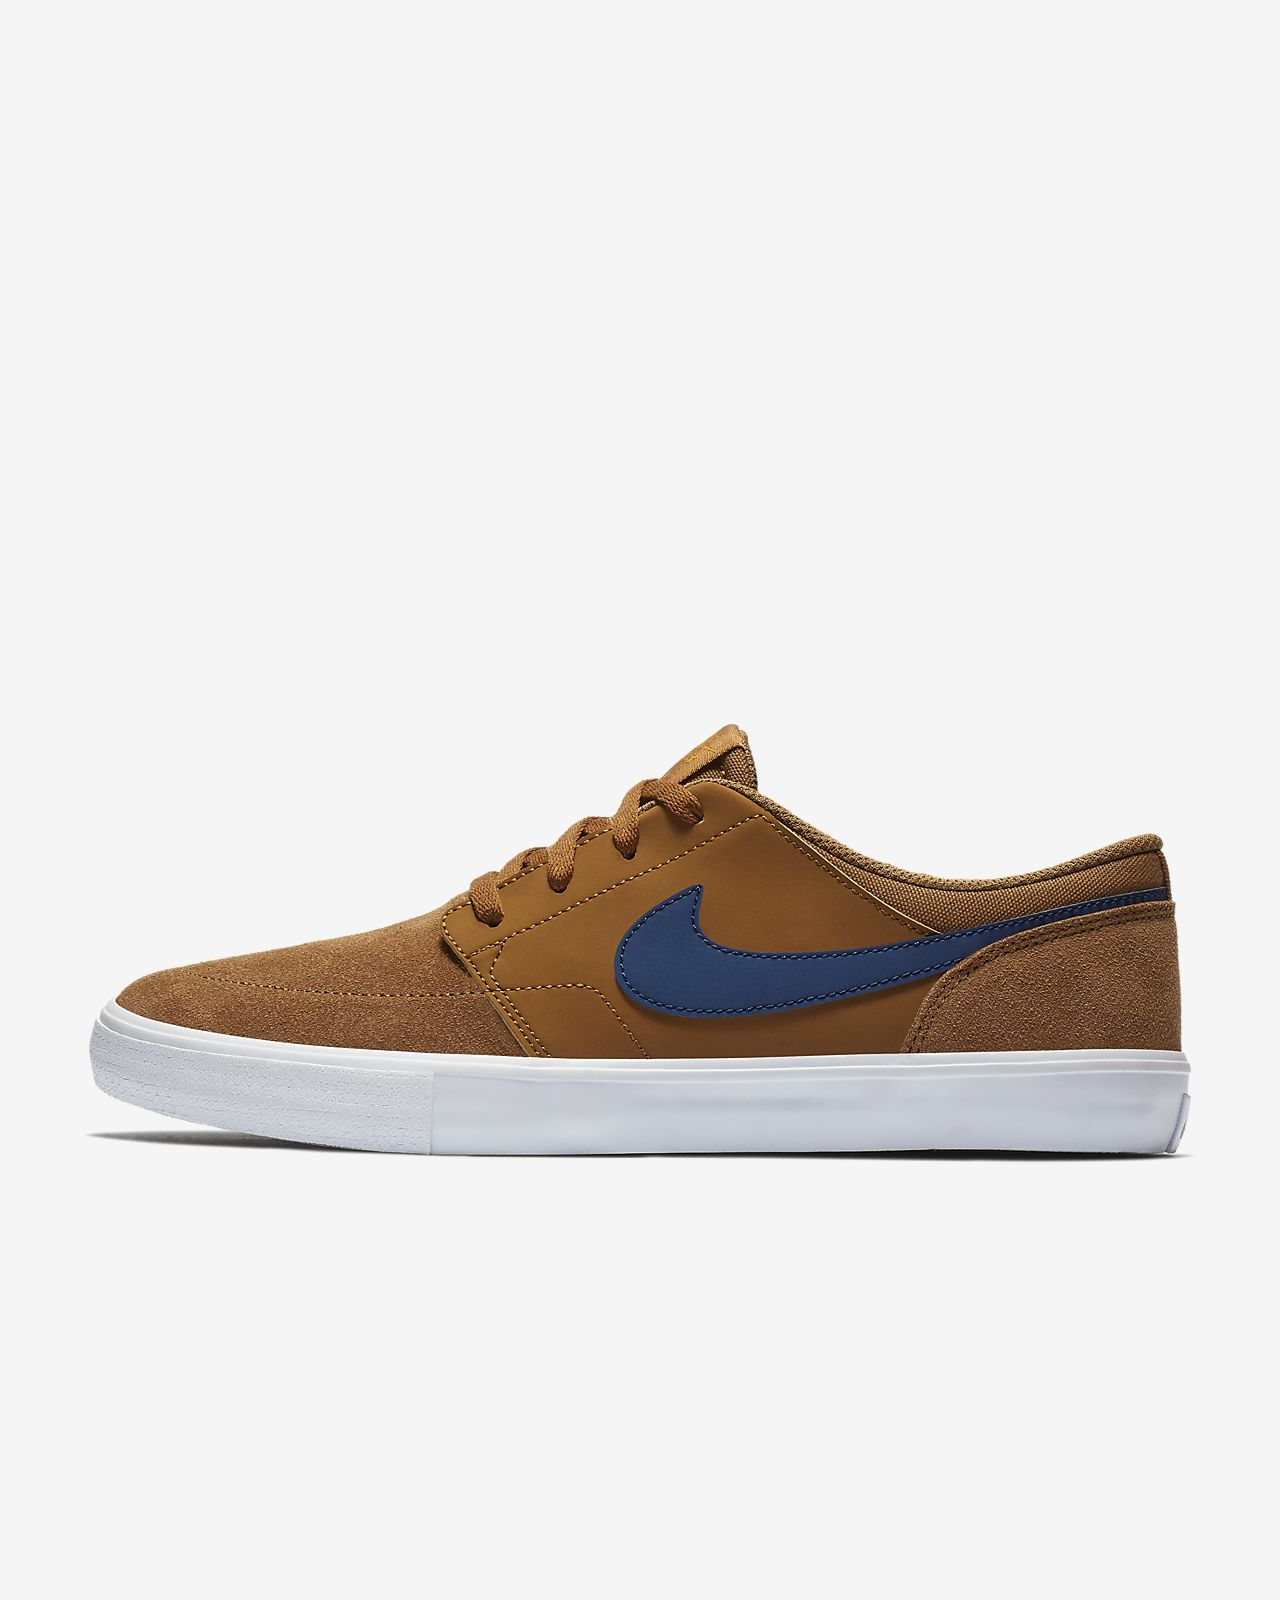 Nike SB Solarsoft Portmore II Herren-Skateboardschuh        Nicht so teuer  c85a55